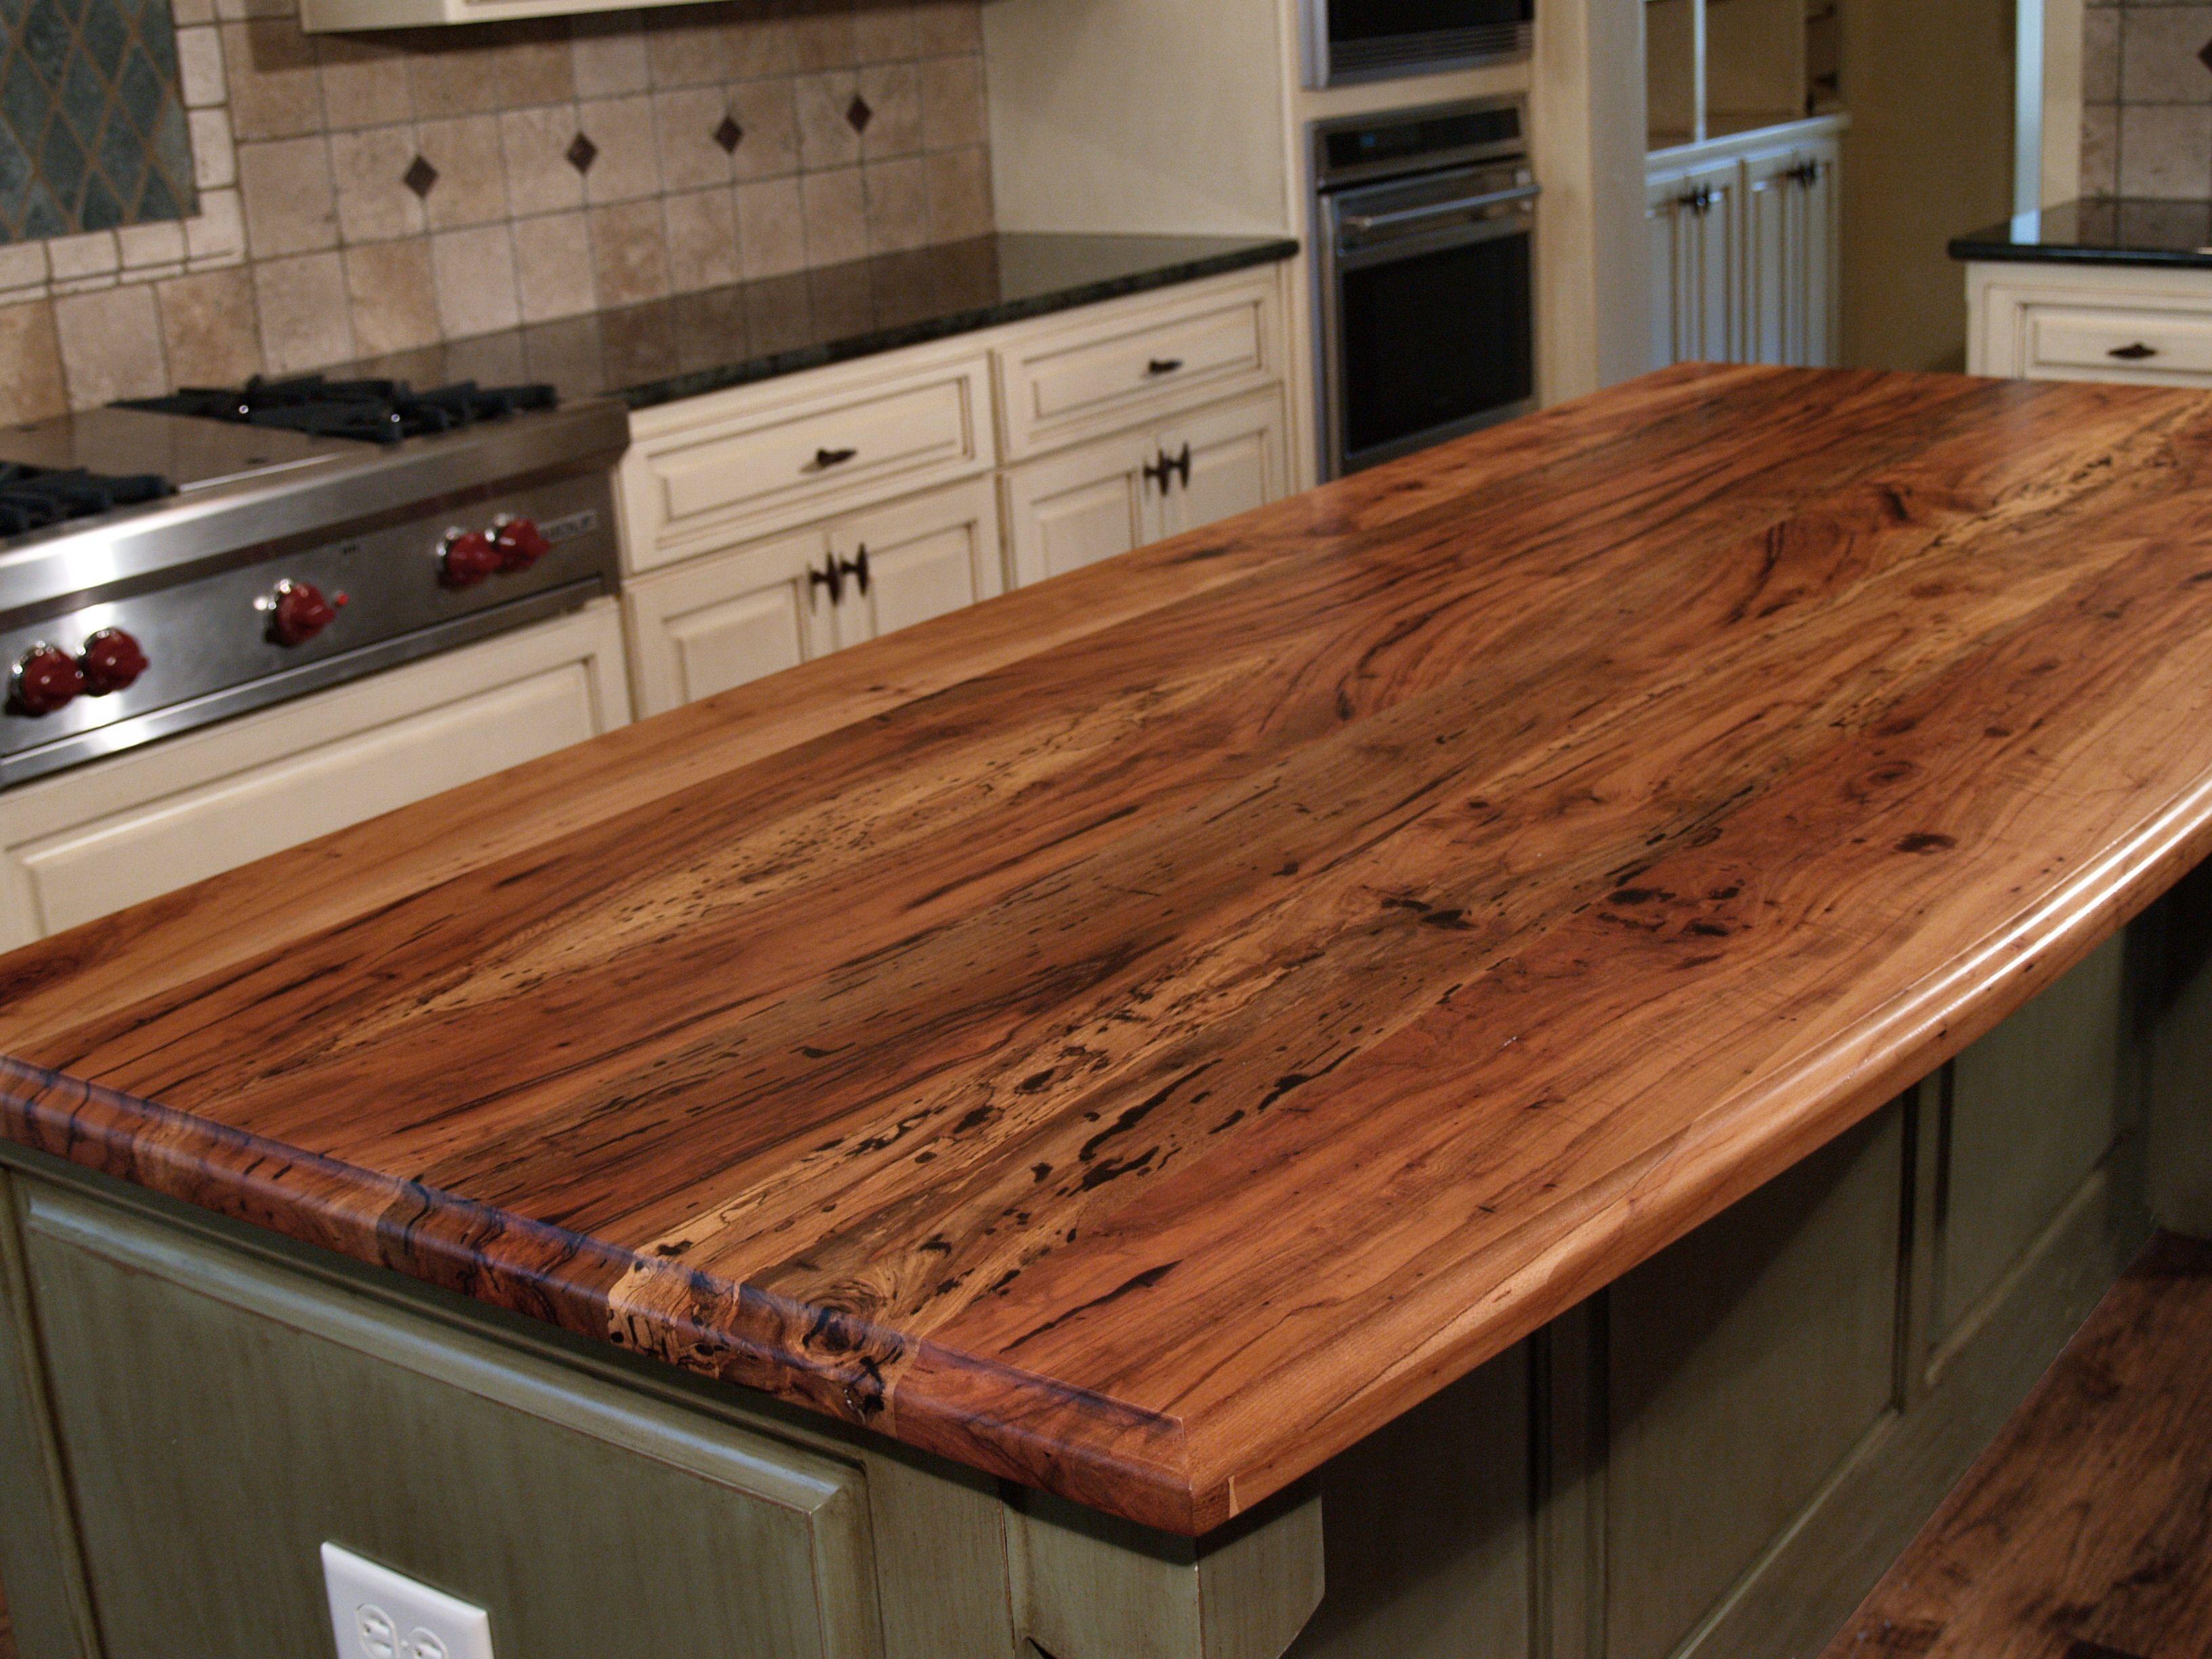 Spalted Pecan Wood Countertop Photo Gallery by DeVos Custom Woodworking